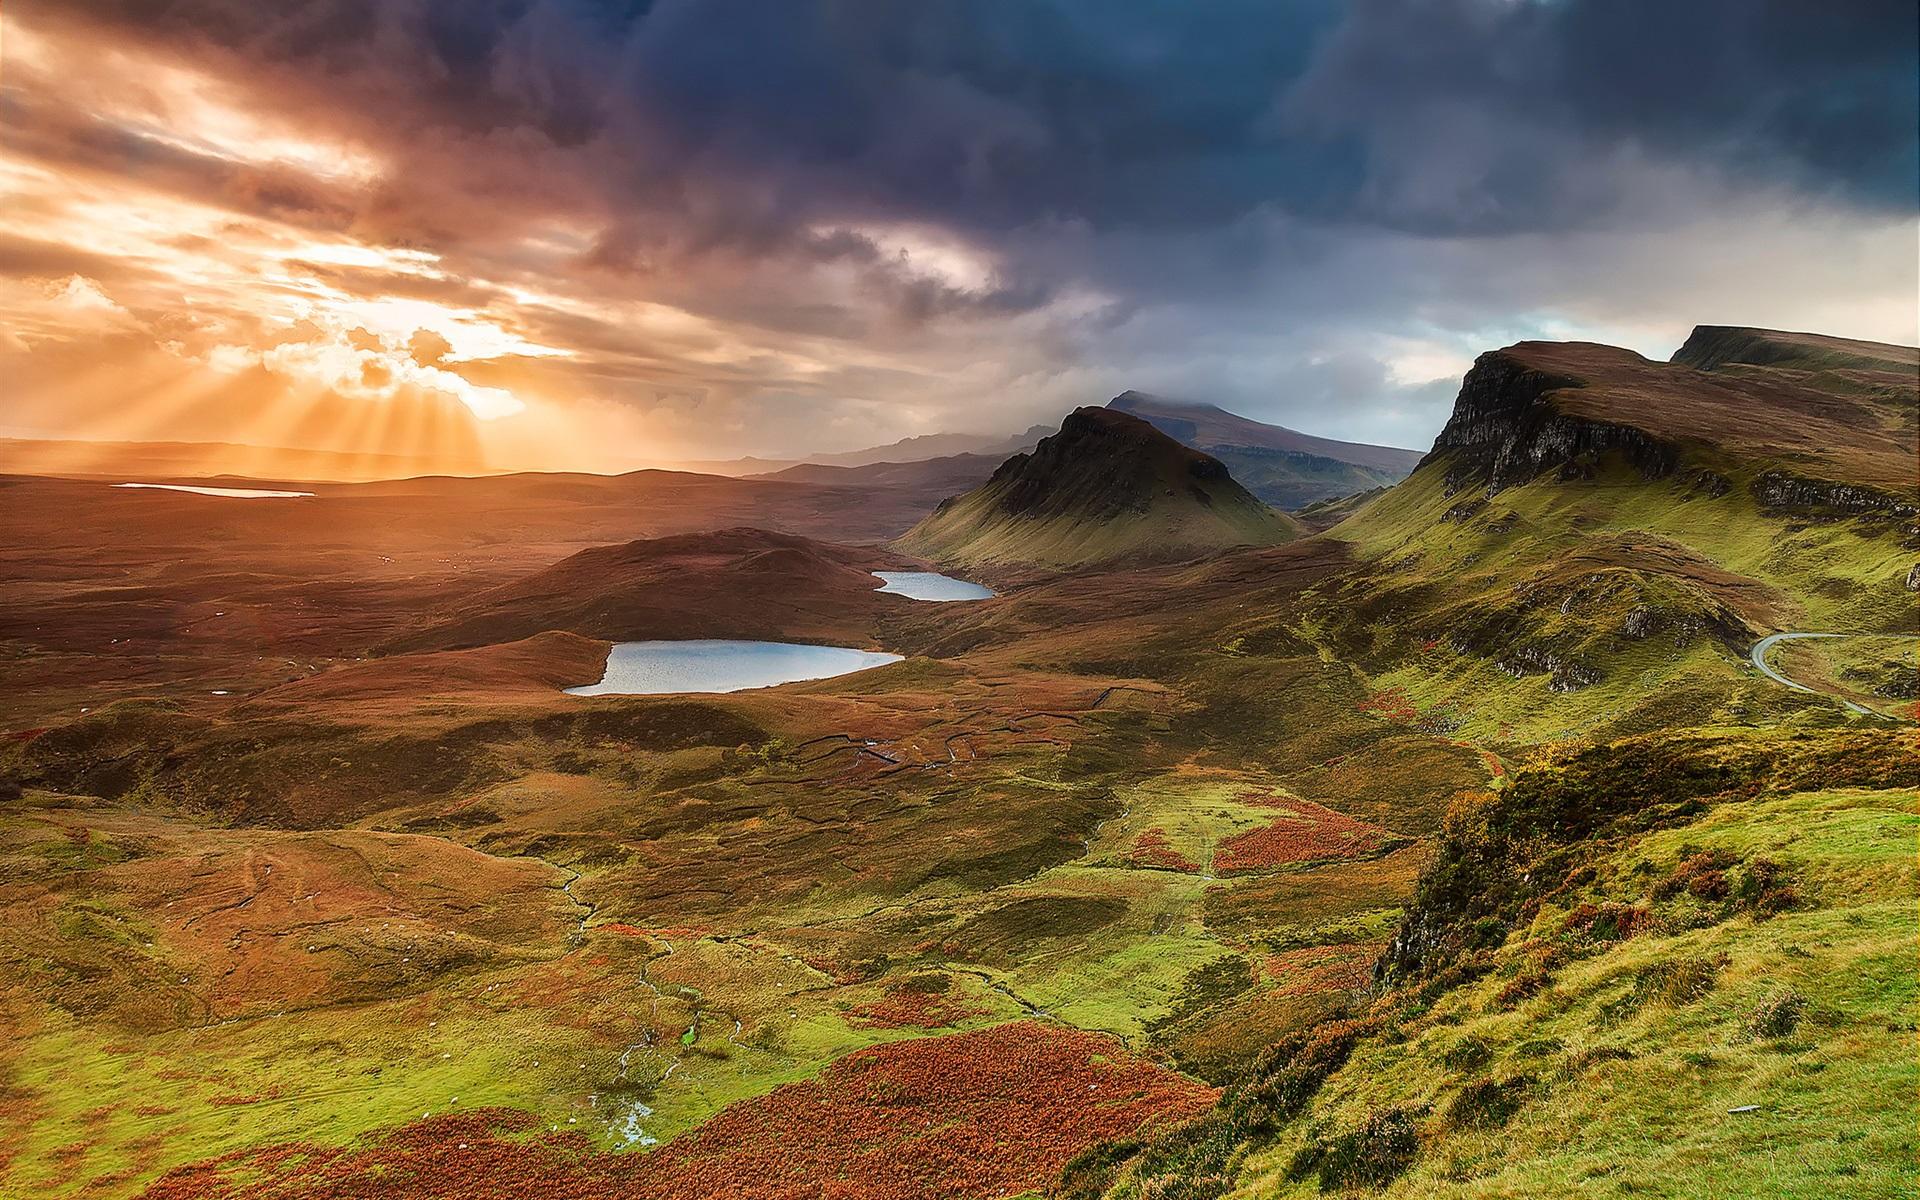 Wallpaper Scotland Isle Of Skye Hills Mountains Lake Sunset